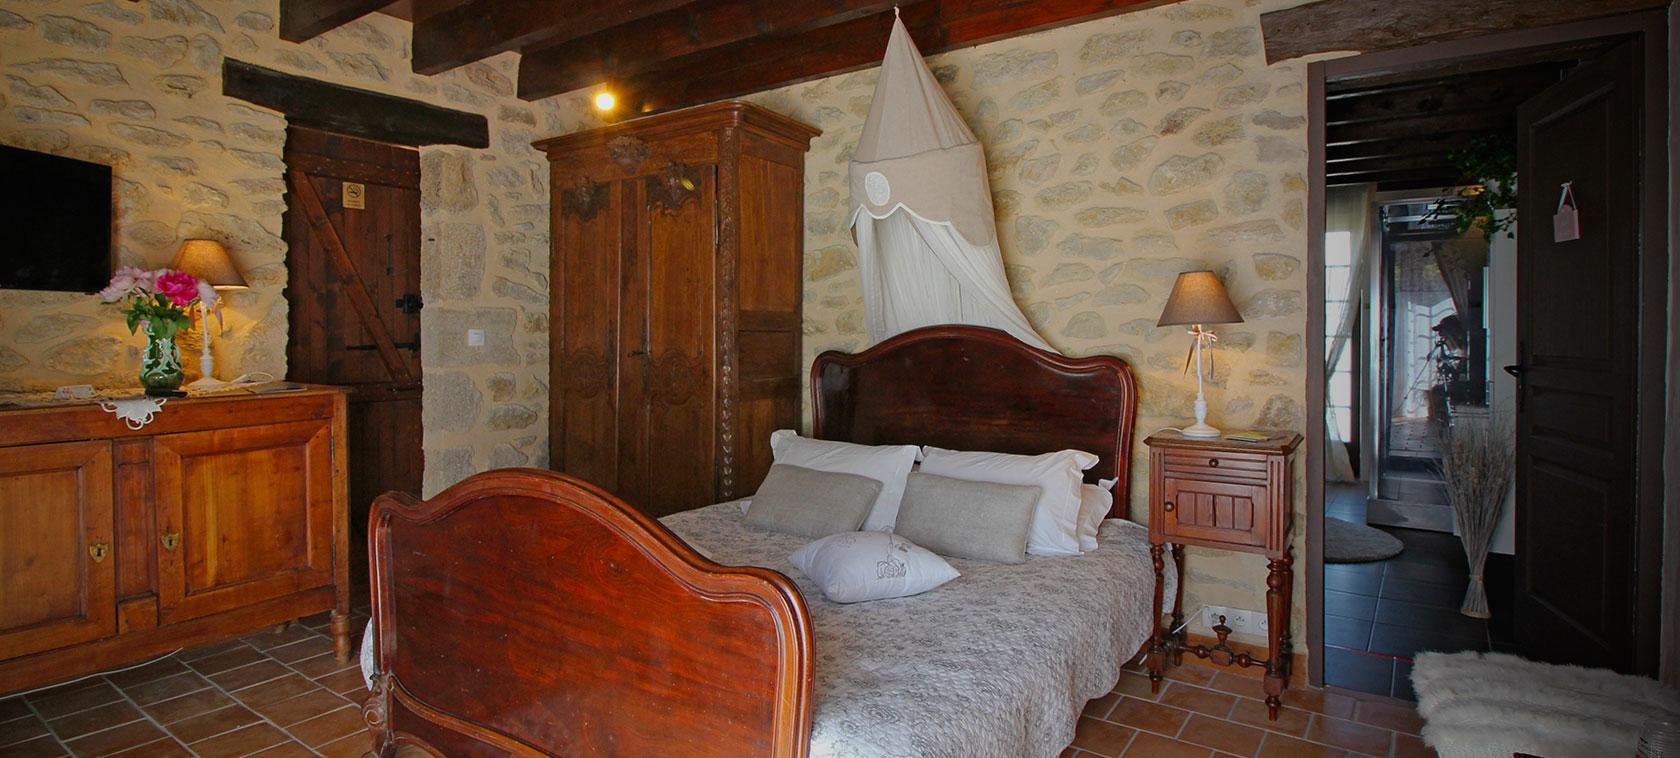 Chardonnay room